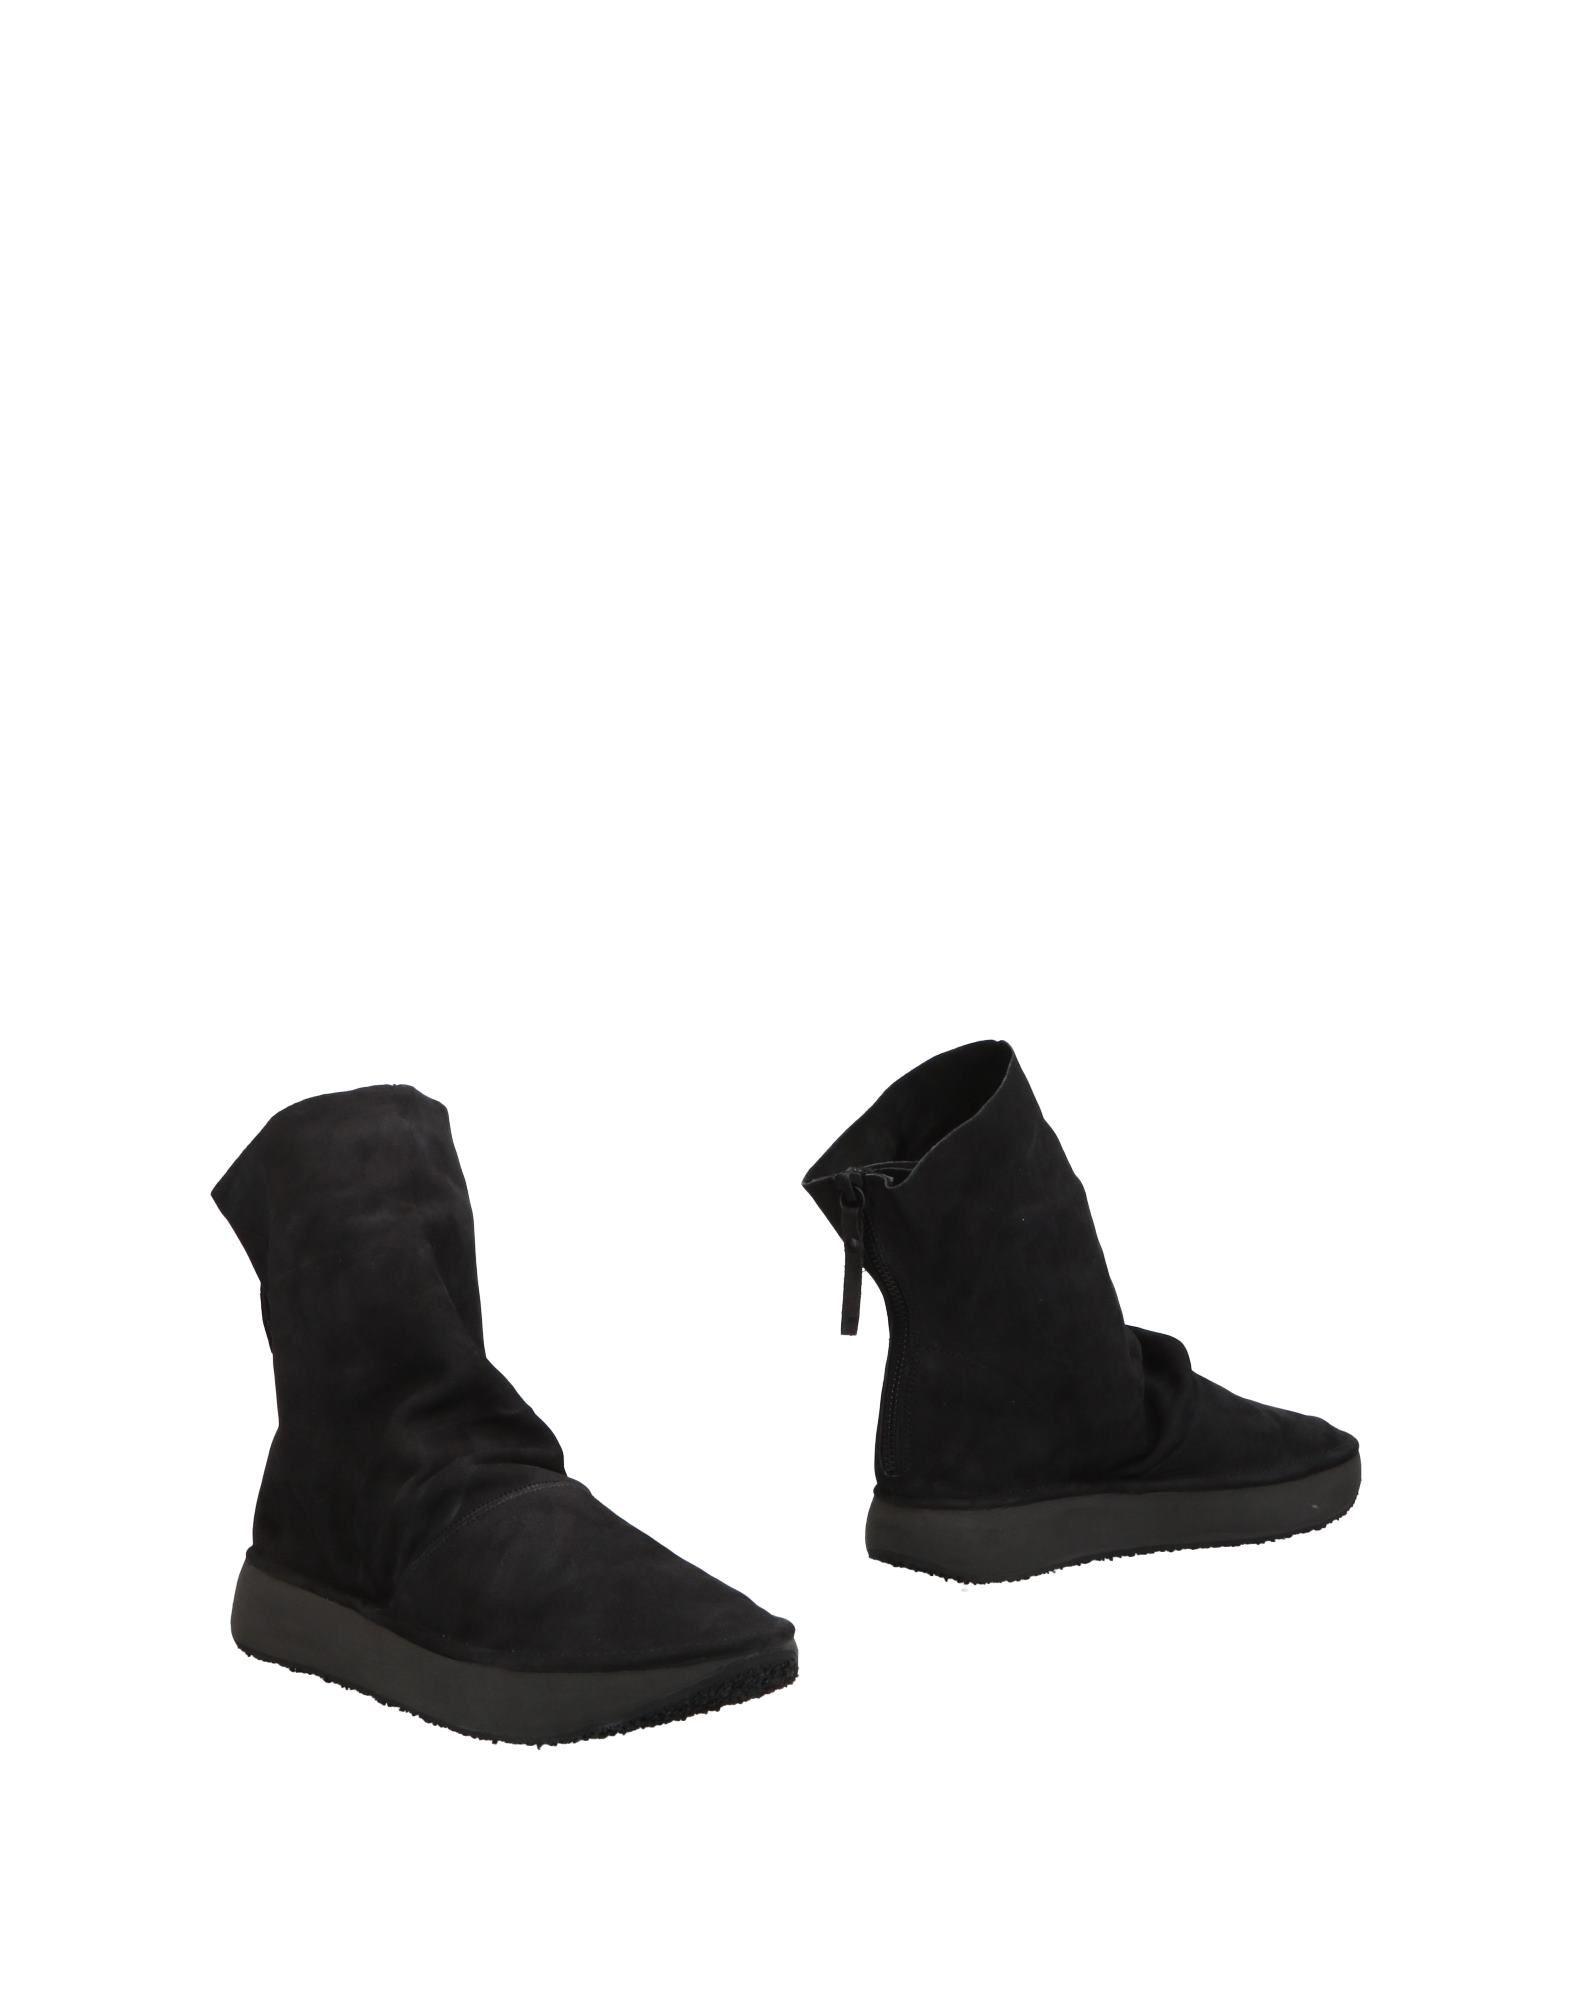 Stilvolle billige Schuhe Damen Puro Individual Secret Stiefelette Damen Schuhe  11507890QO 4d1476